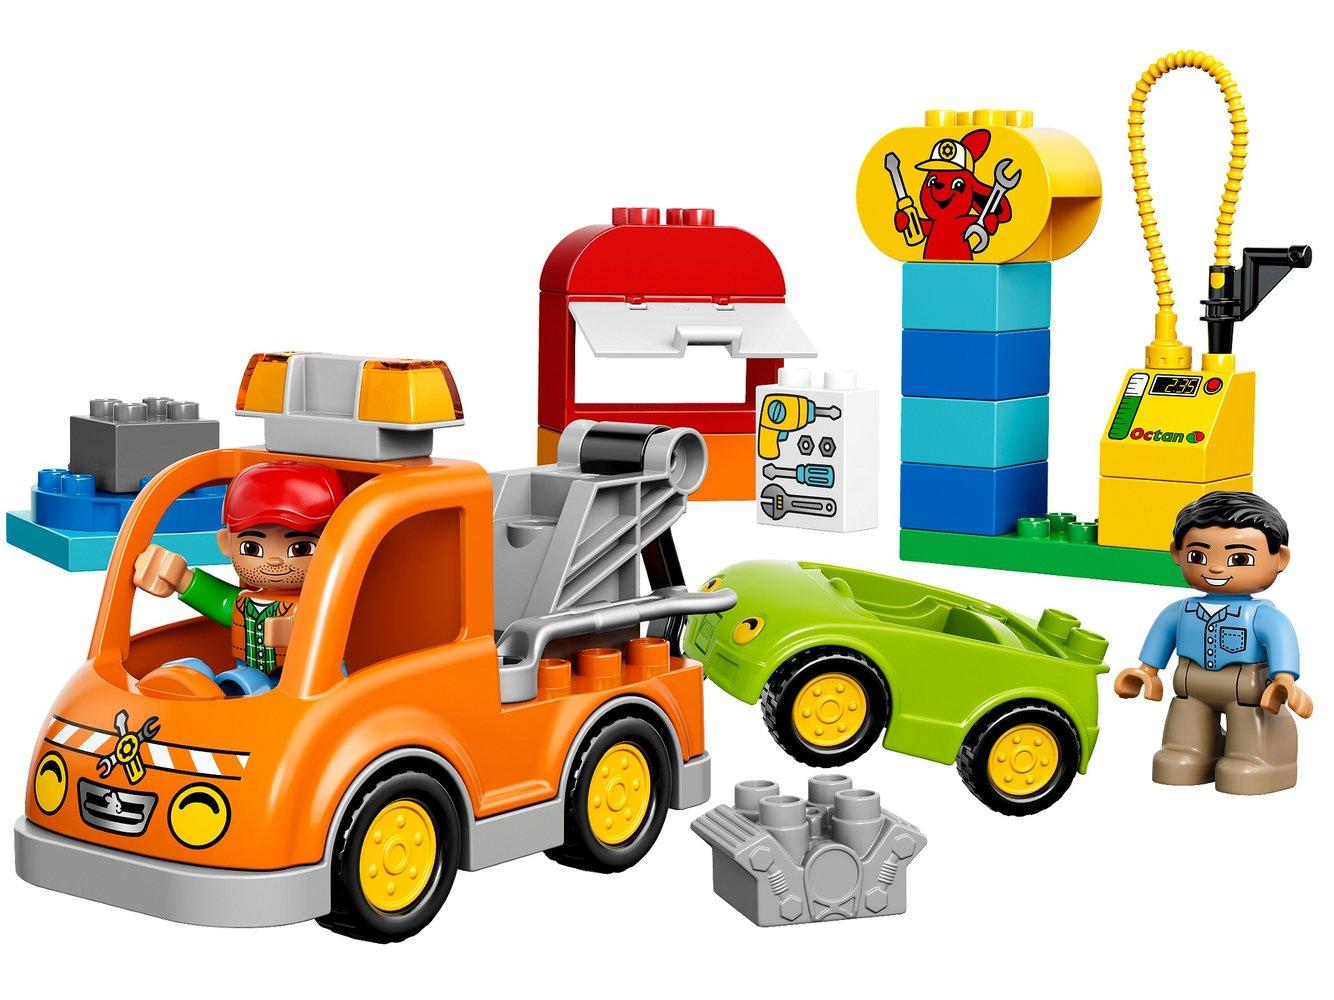 Tow Truck Set